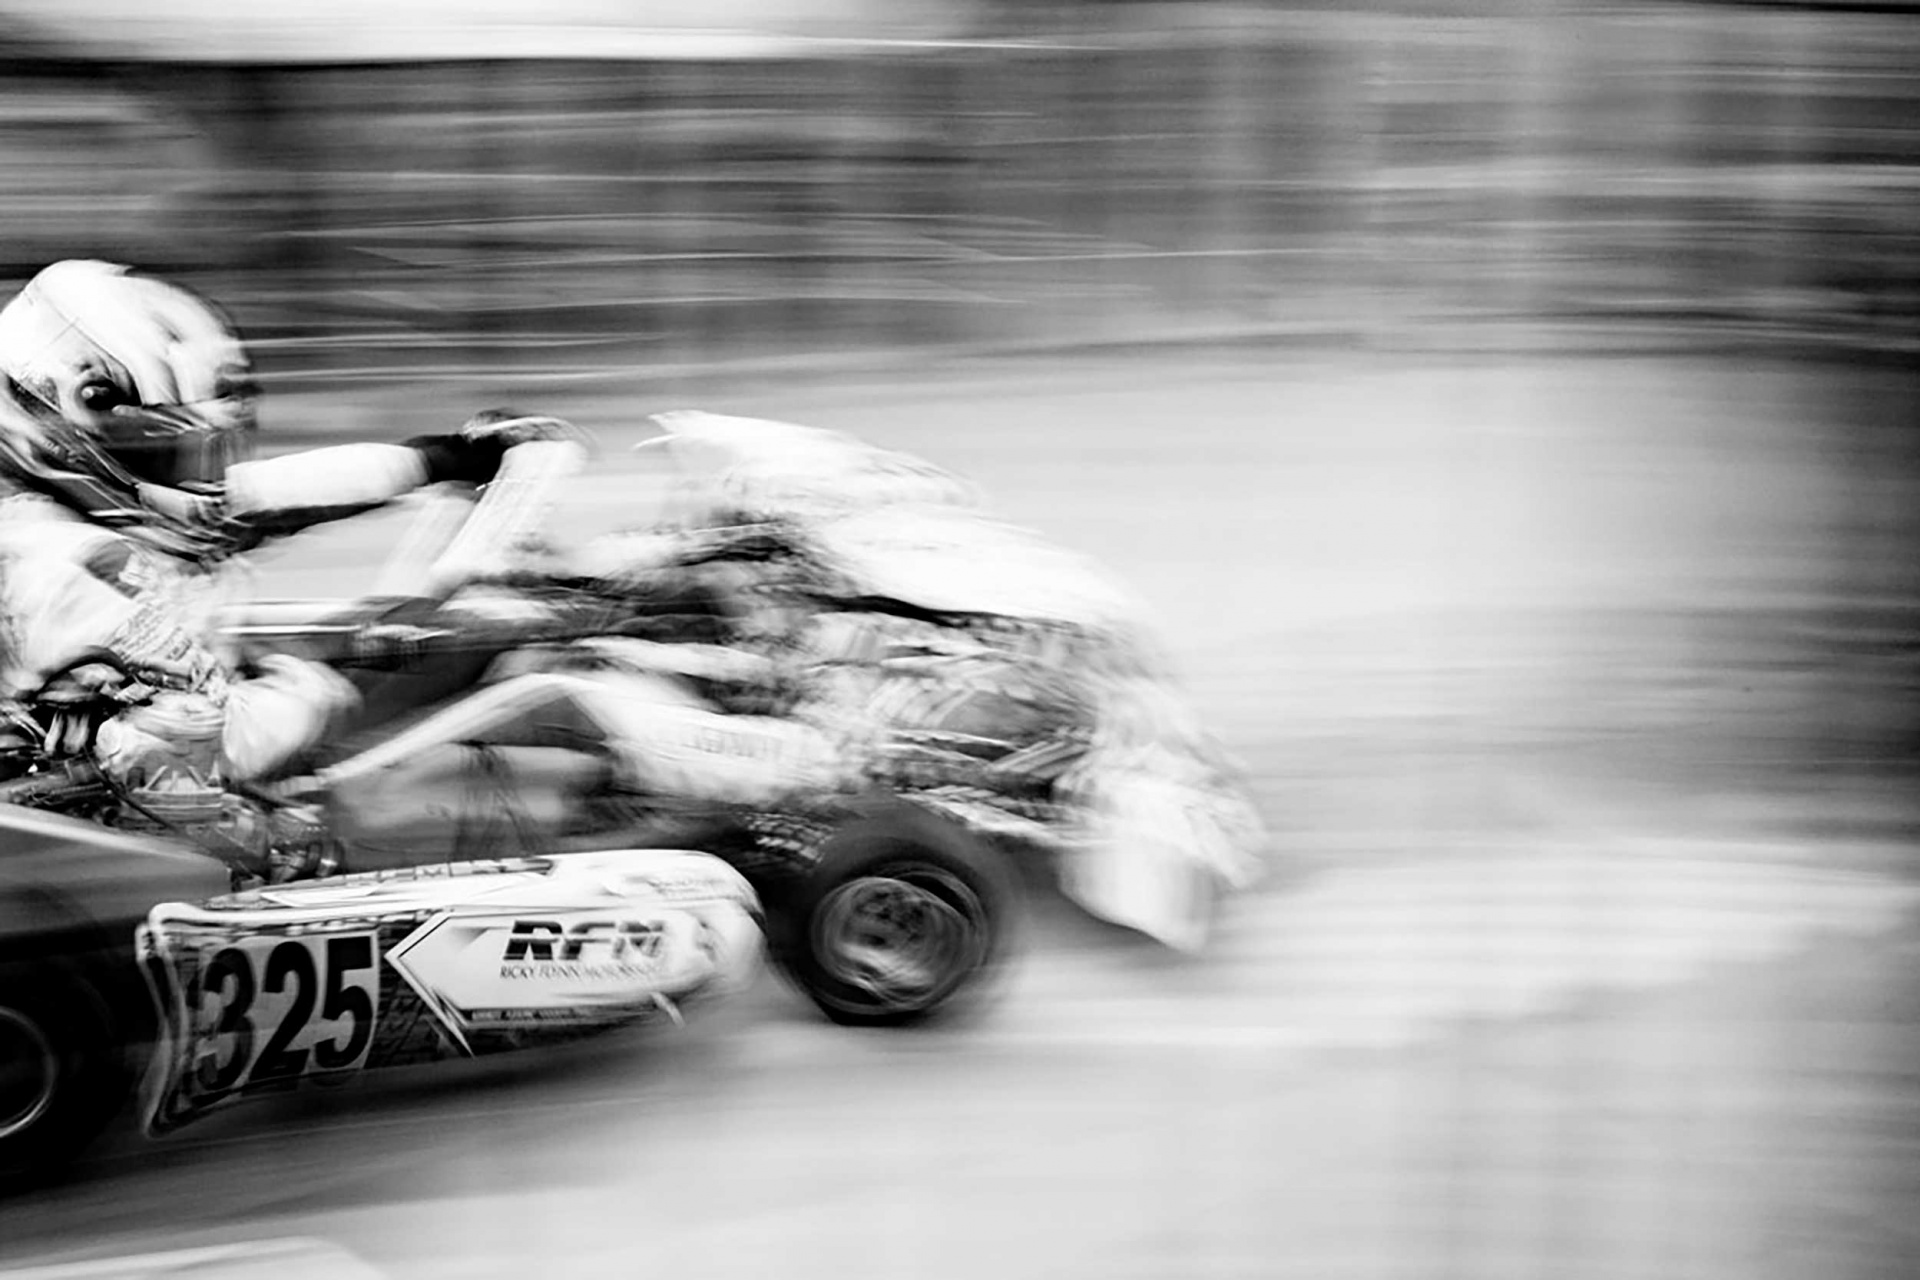 Motorsport Photographers